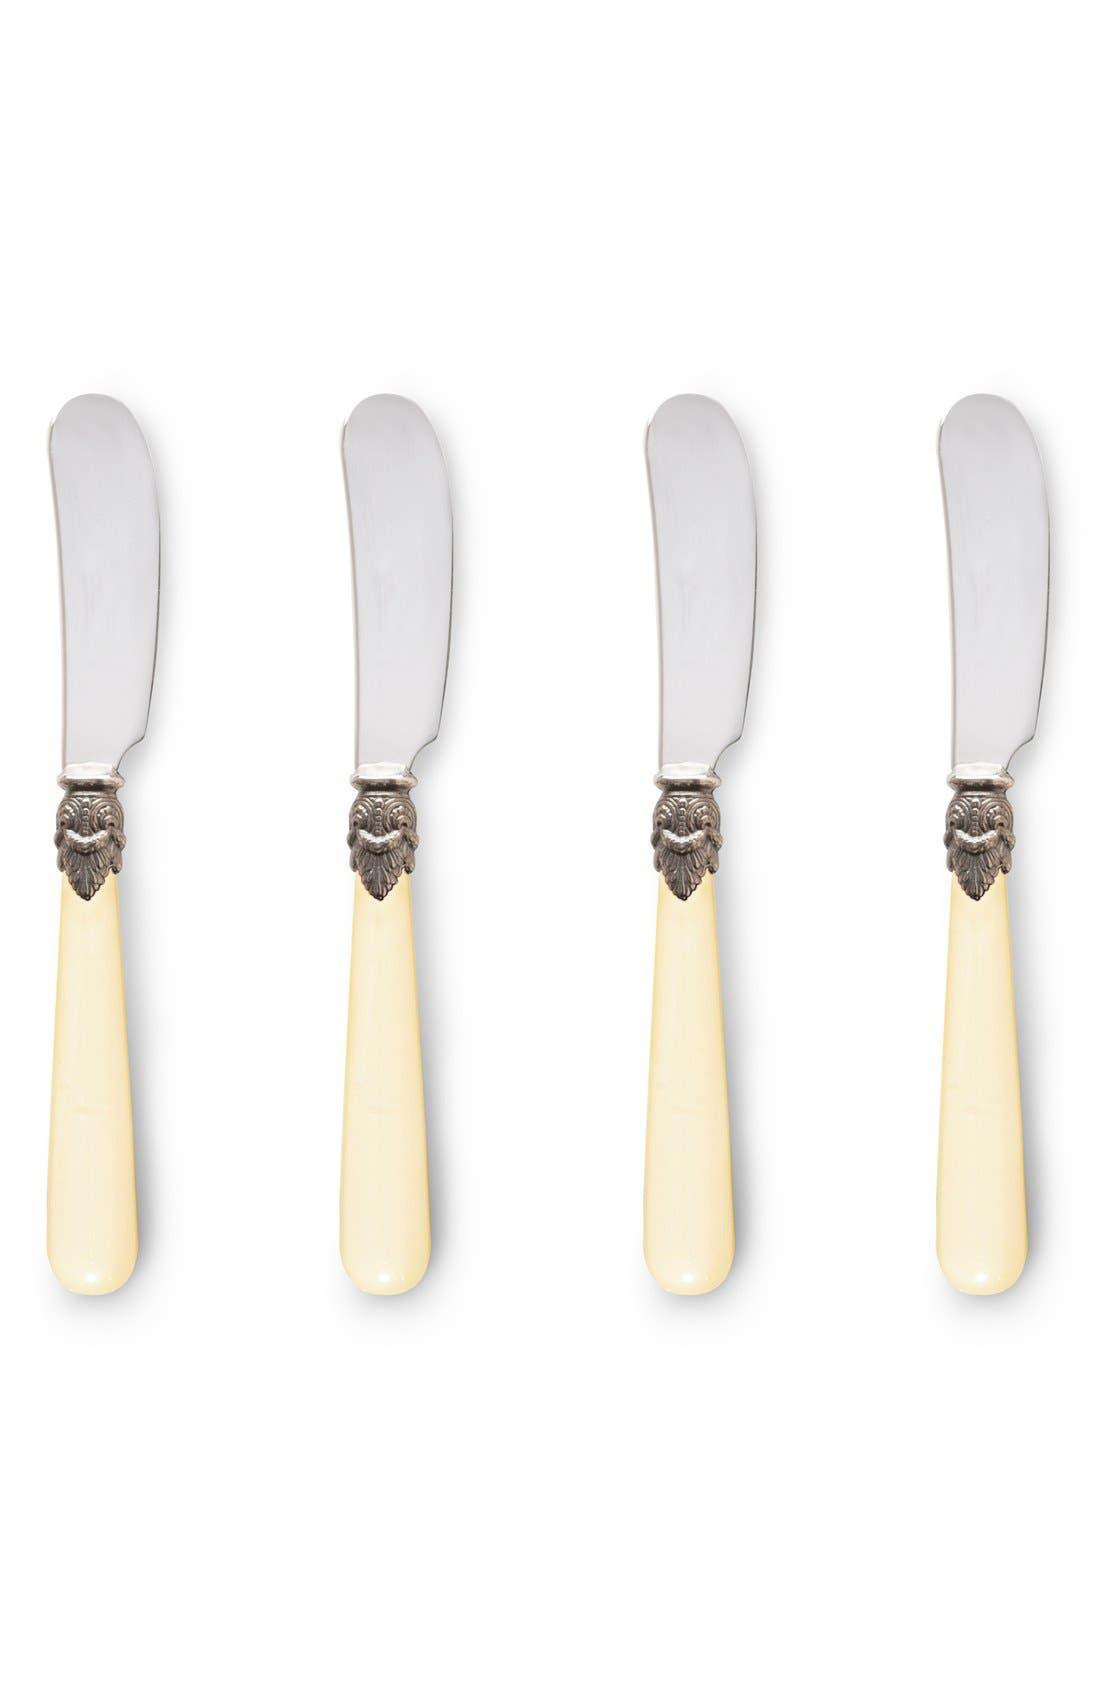 'Napoleon' Pate Knives,                             Main thumbnail 1, color,                             900